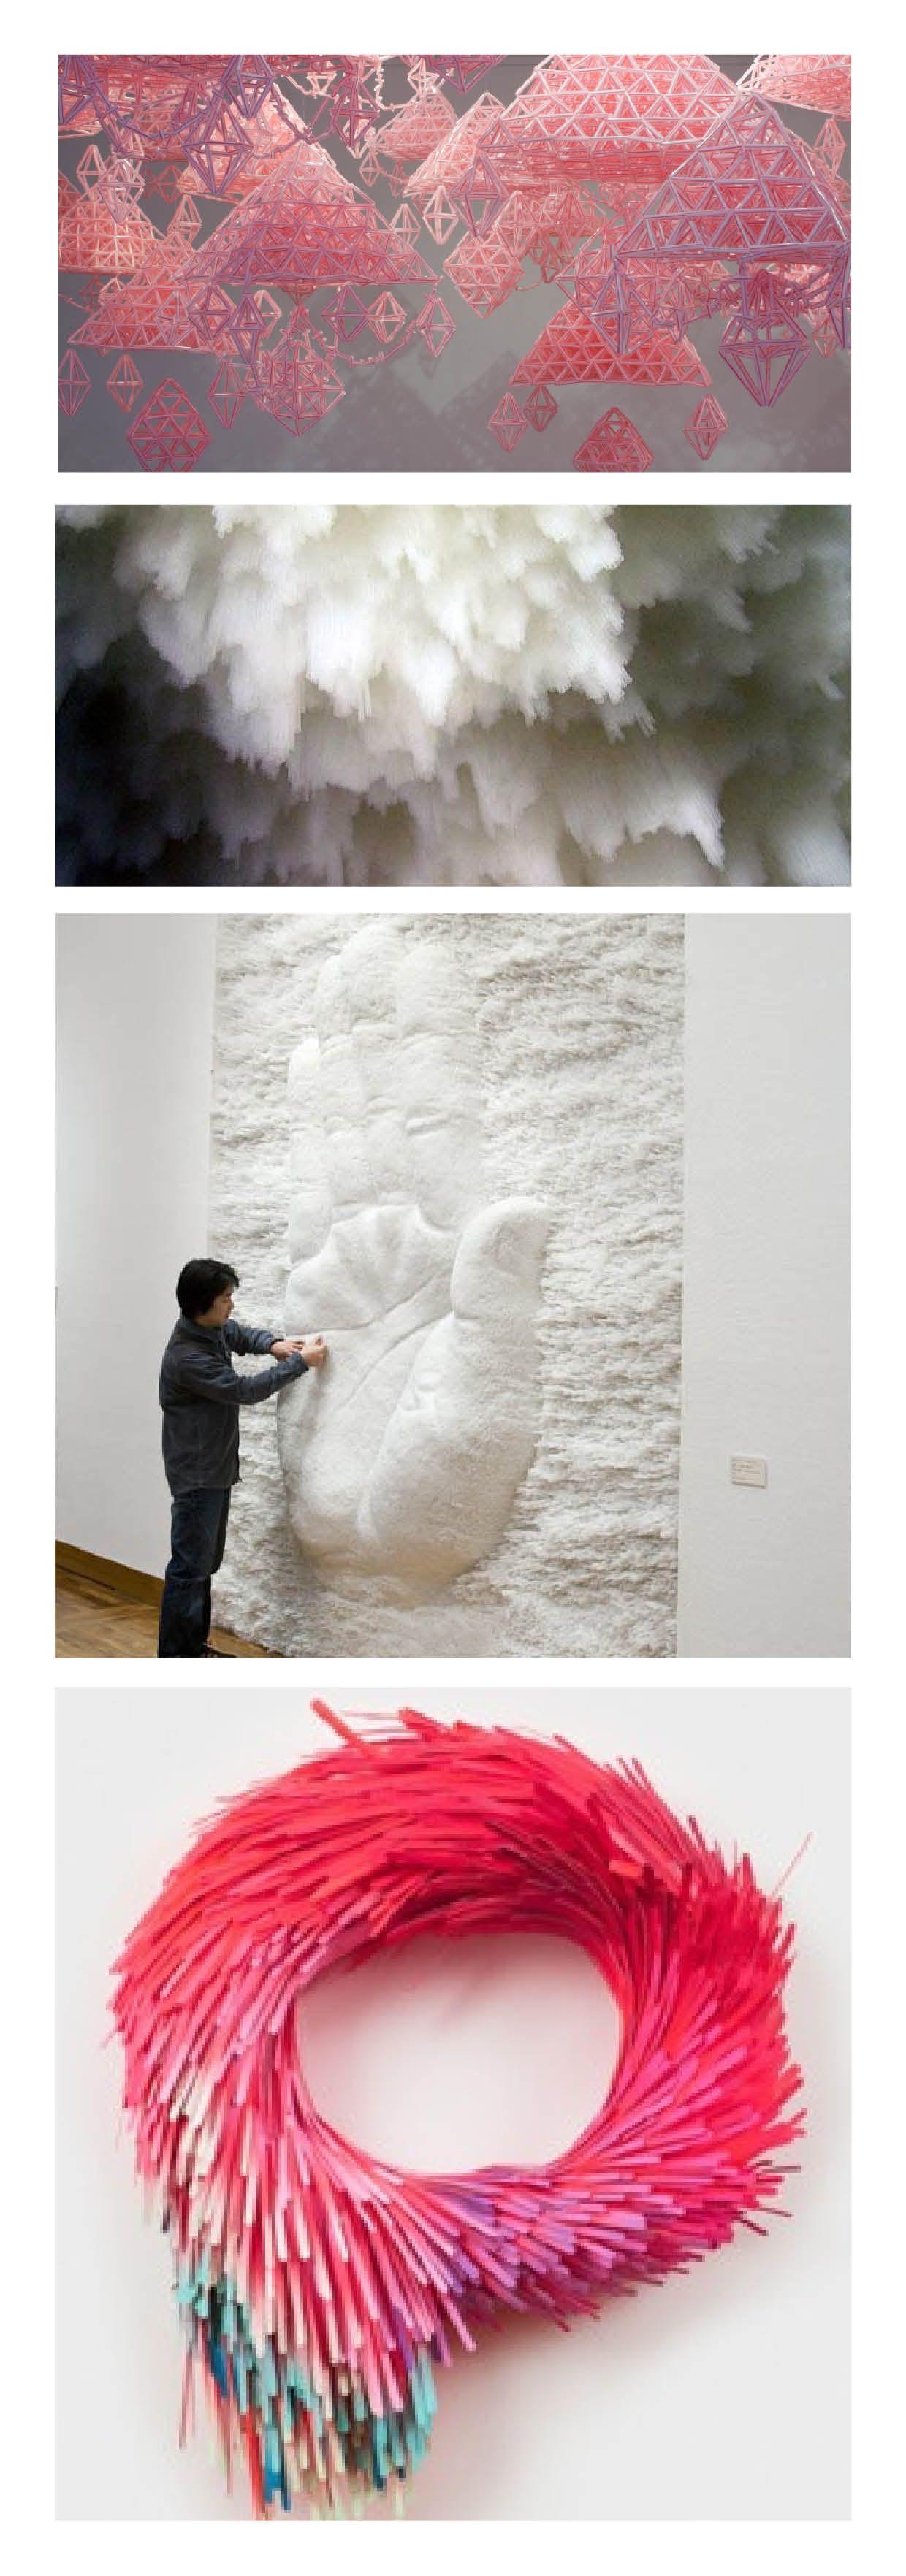 Made from straws | Sculptures&Installations | Pinterest | Straw art ...